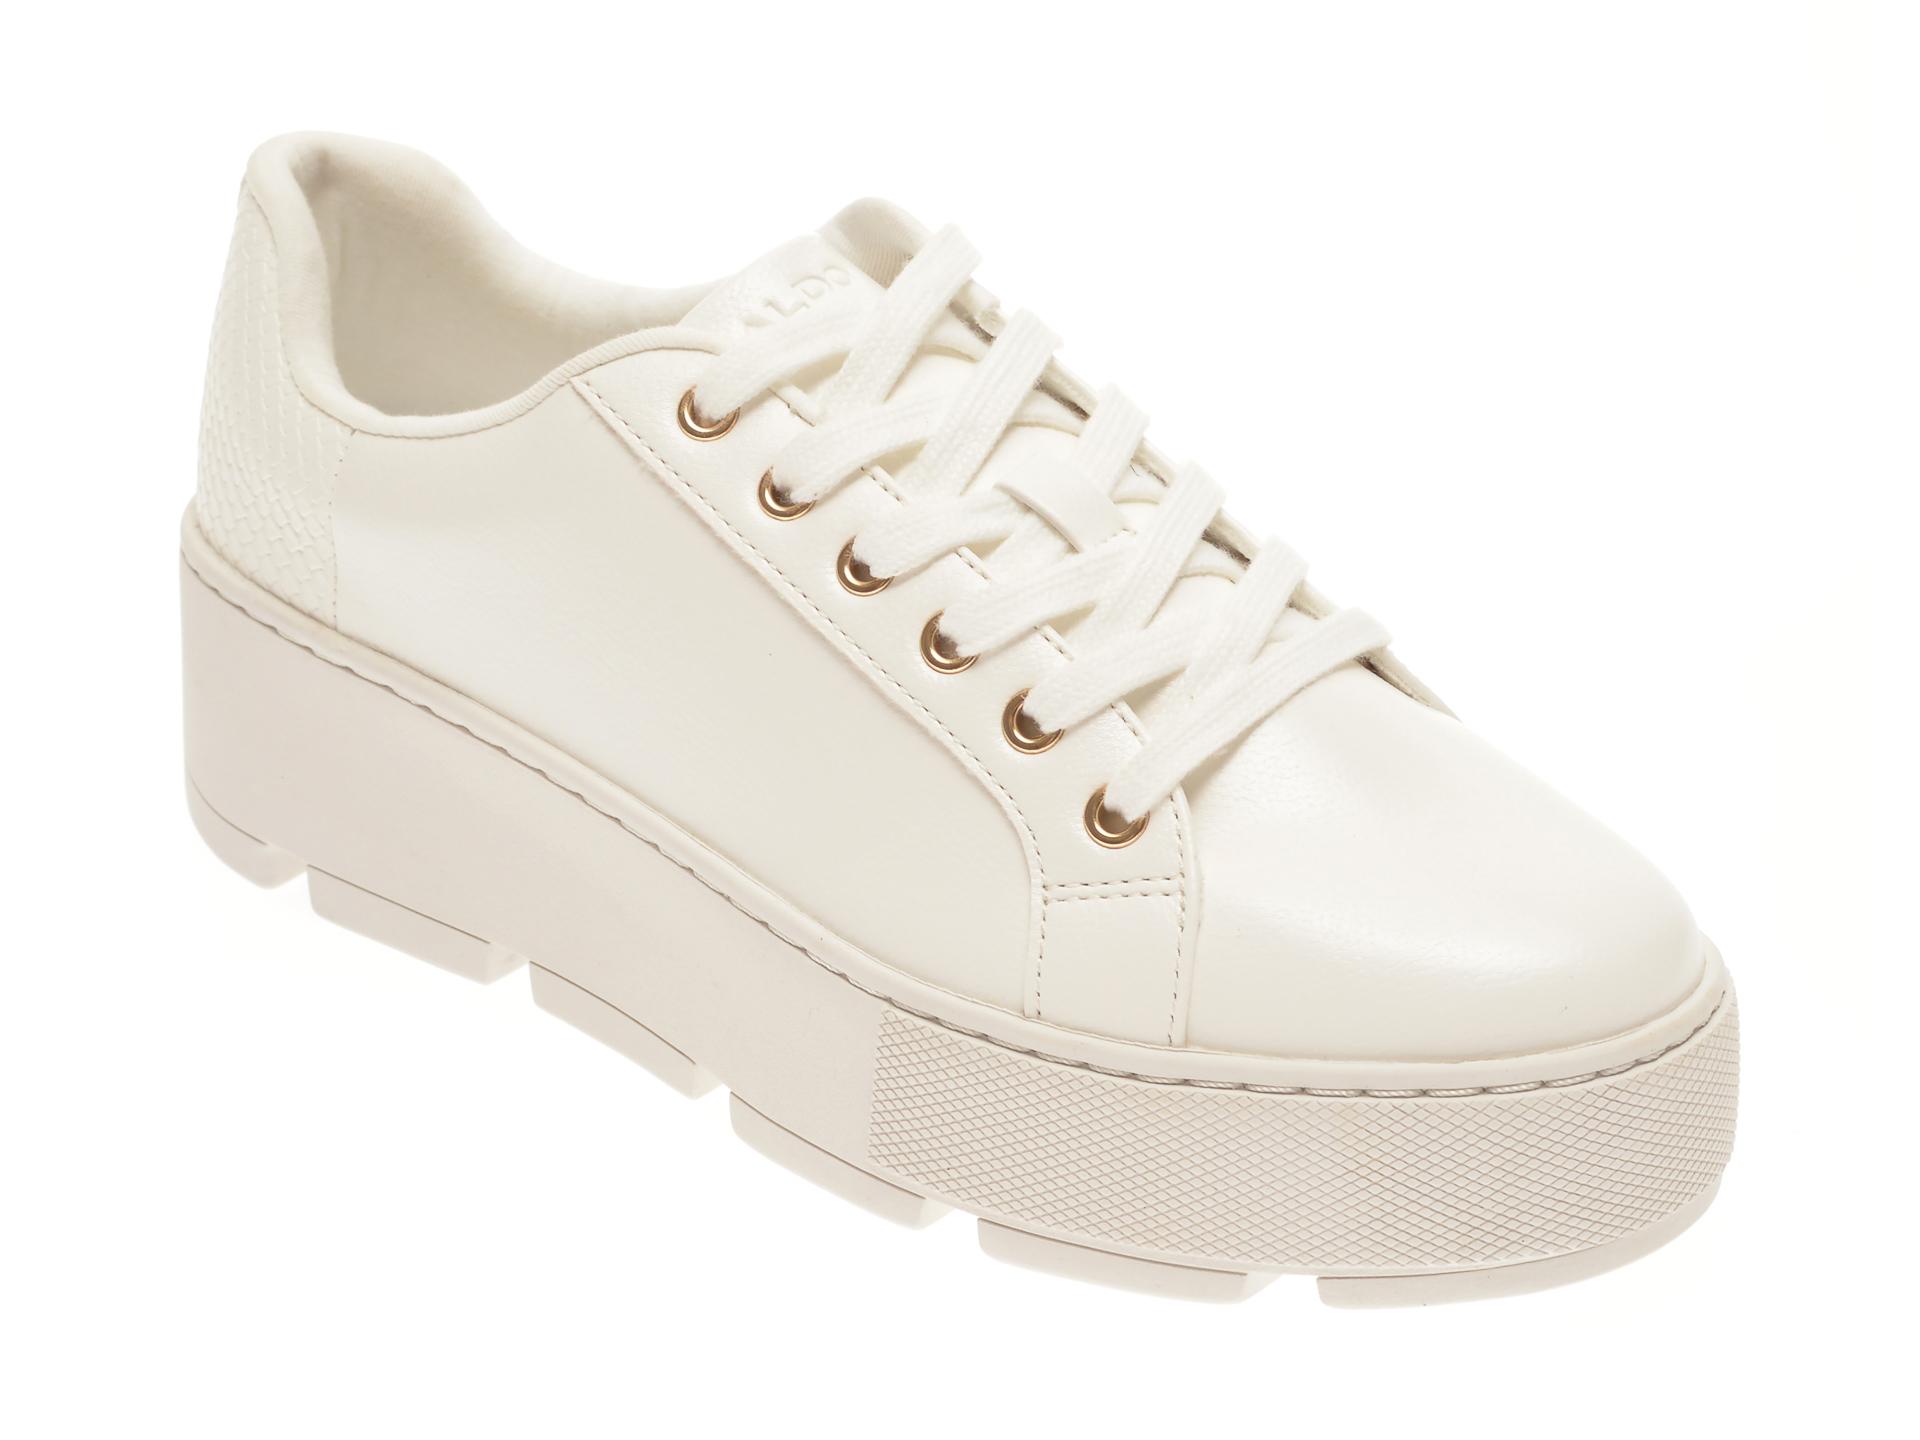 Pantofi sport ALDO albi, Gladesville100, din piele ecologica imagine otter.ro